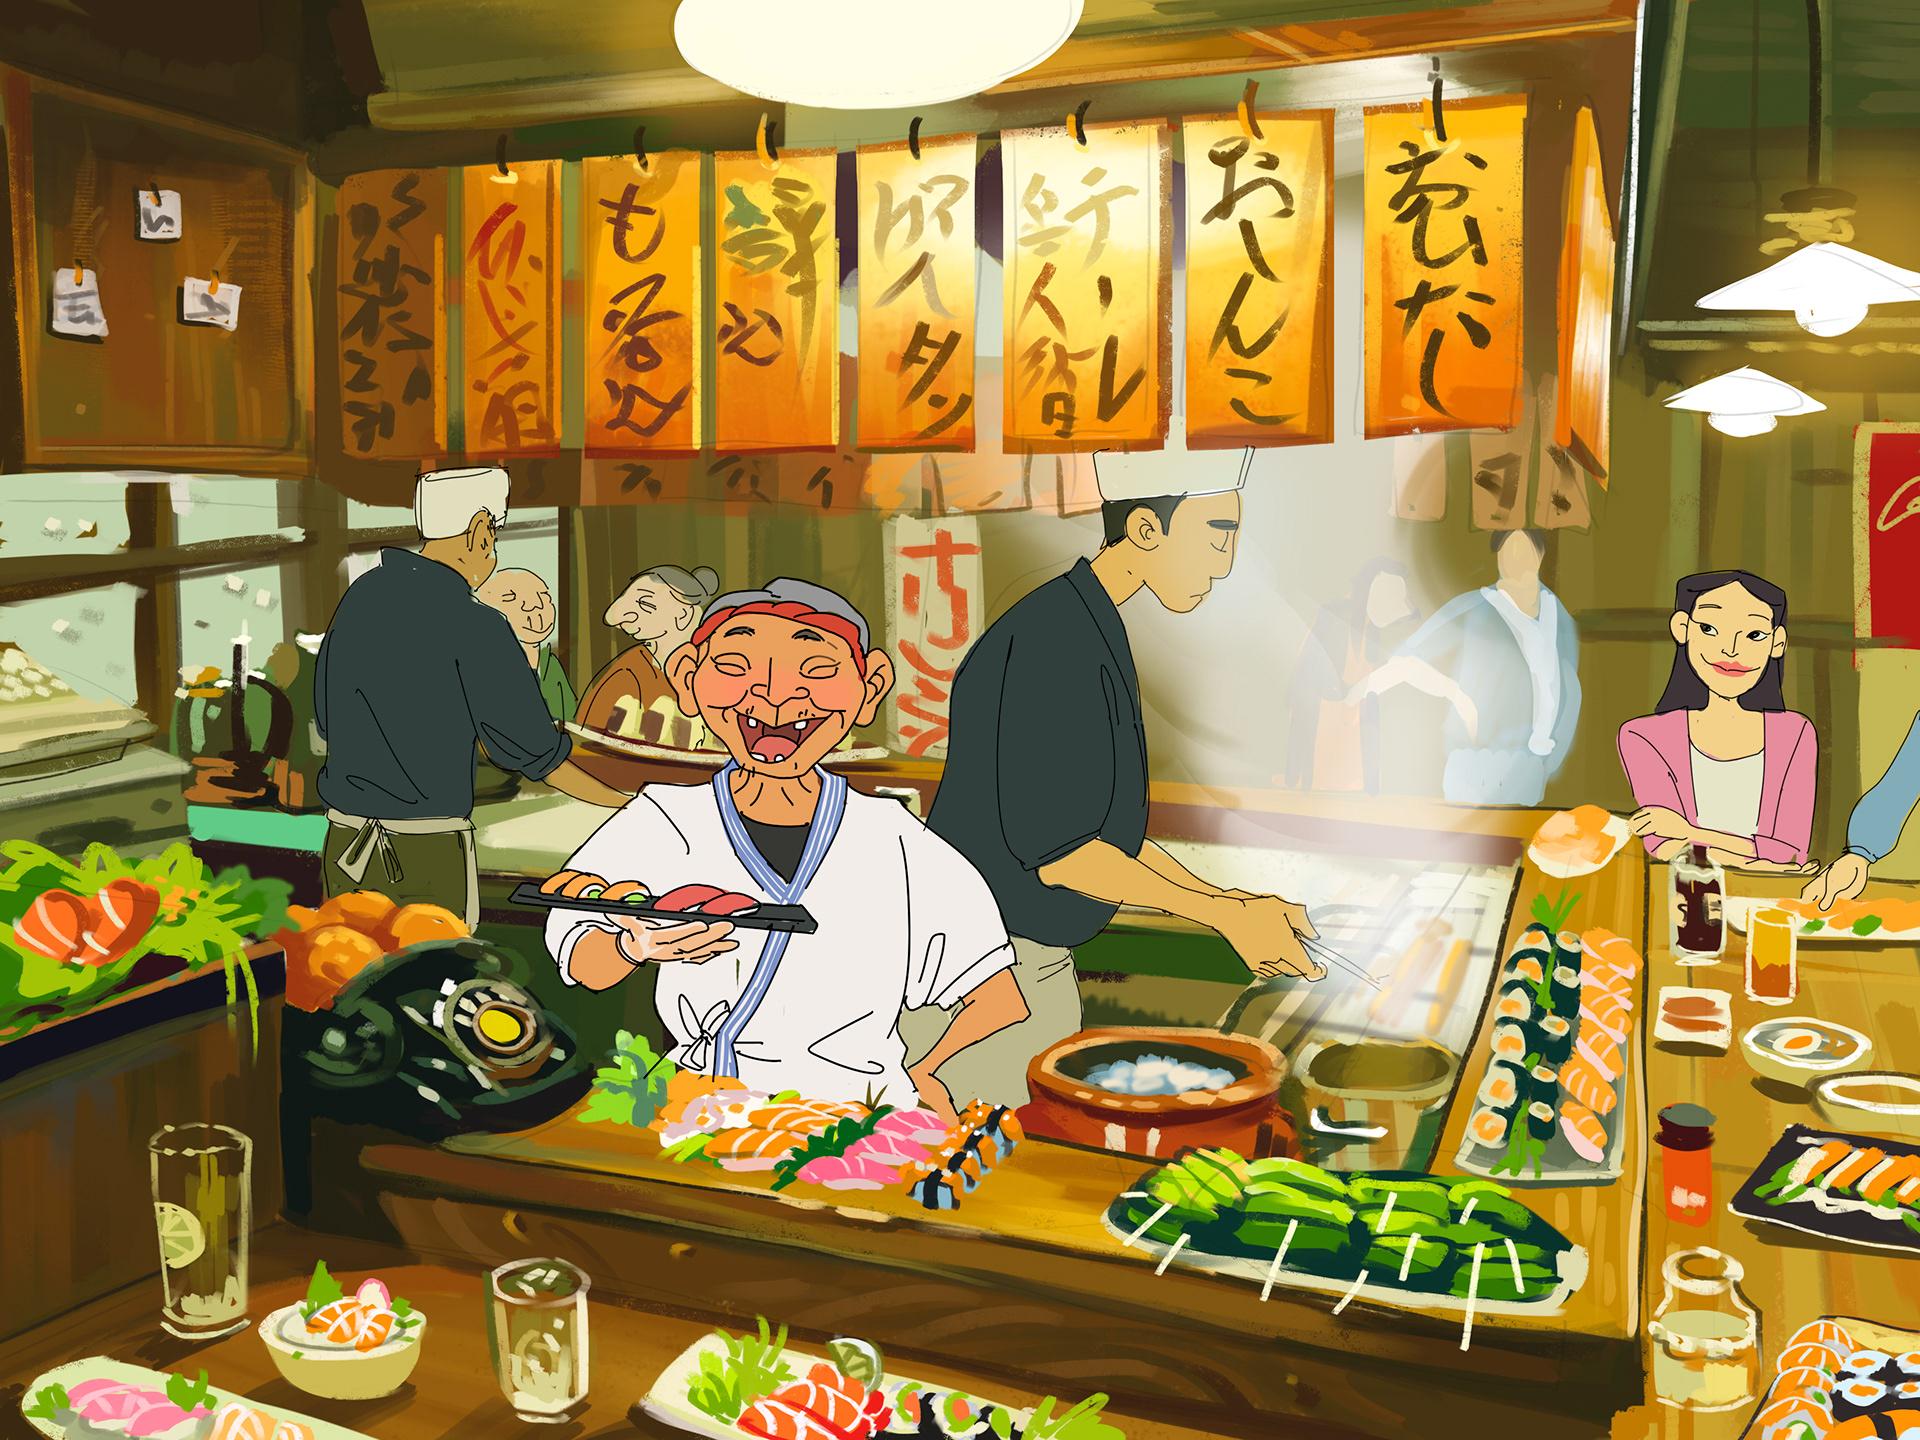 Gastronomy art